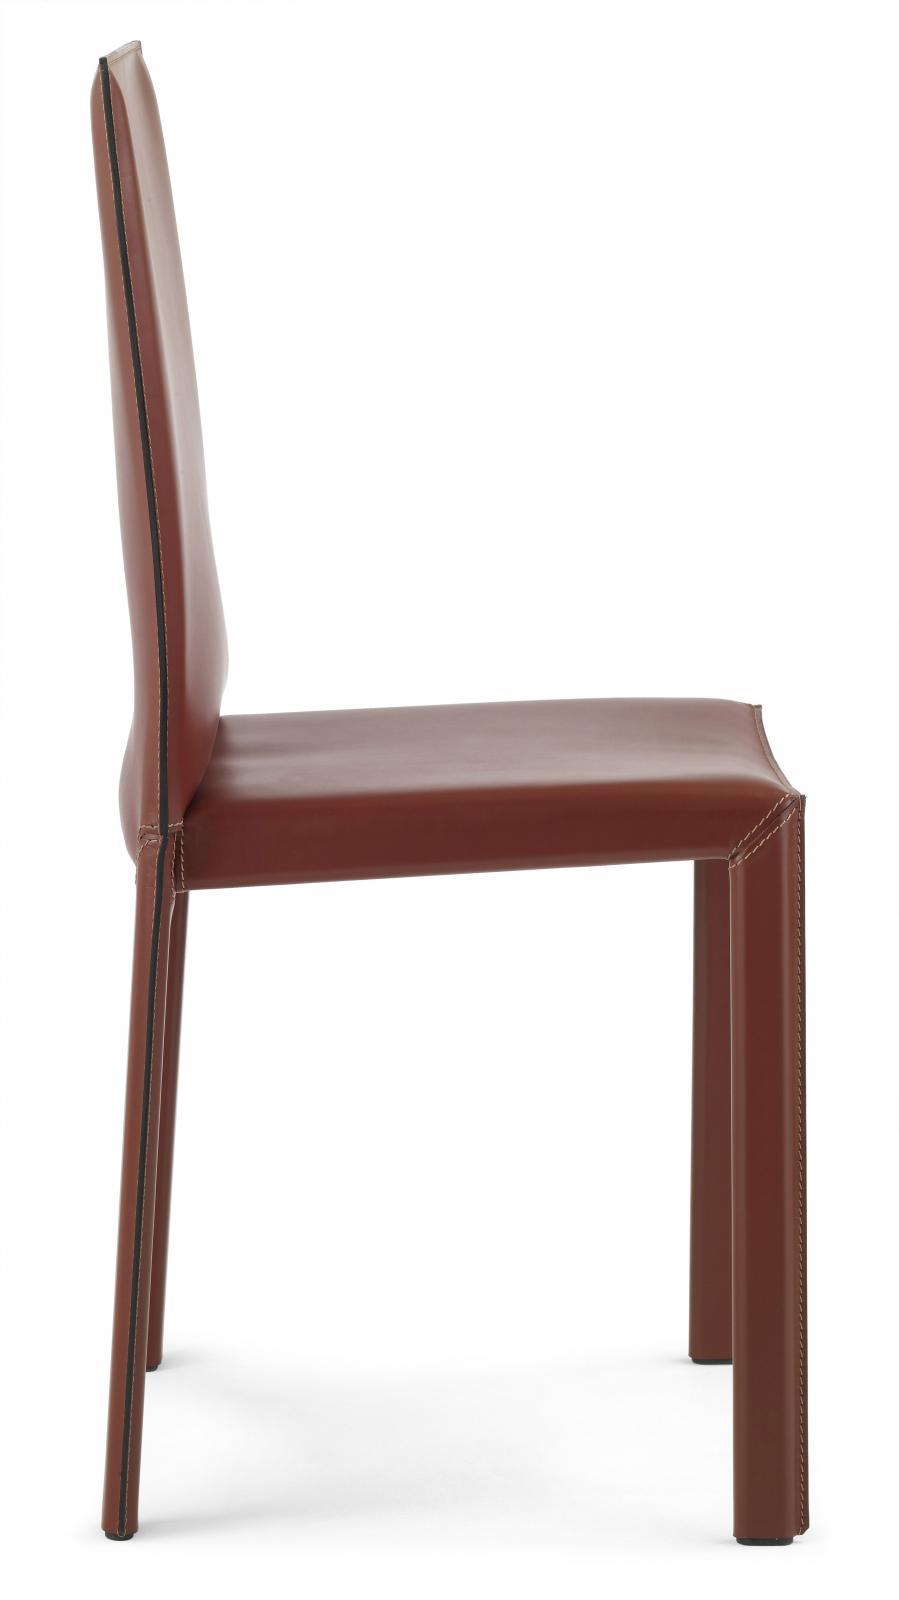 MDC 108 Modern Dining Chairs